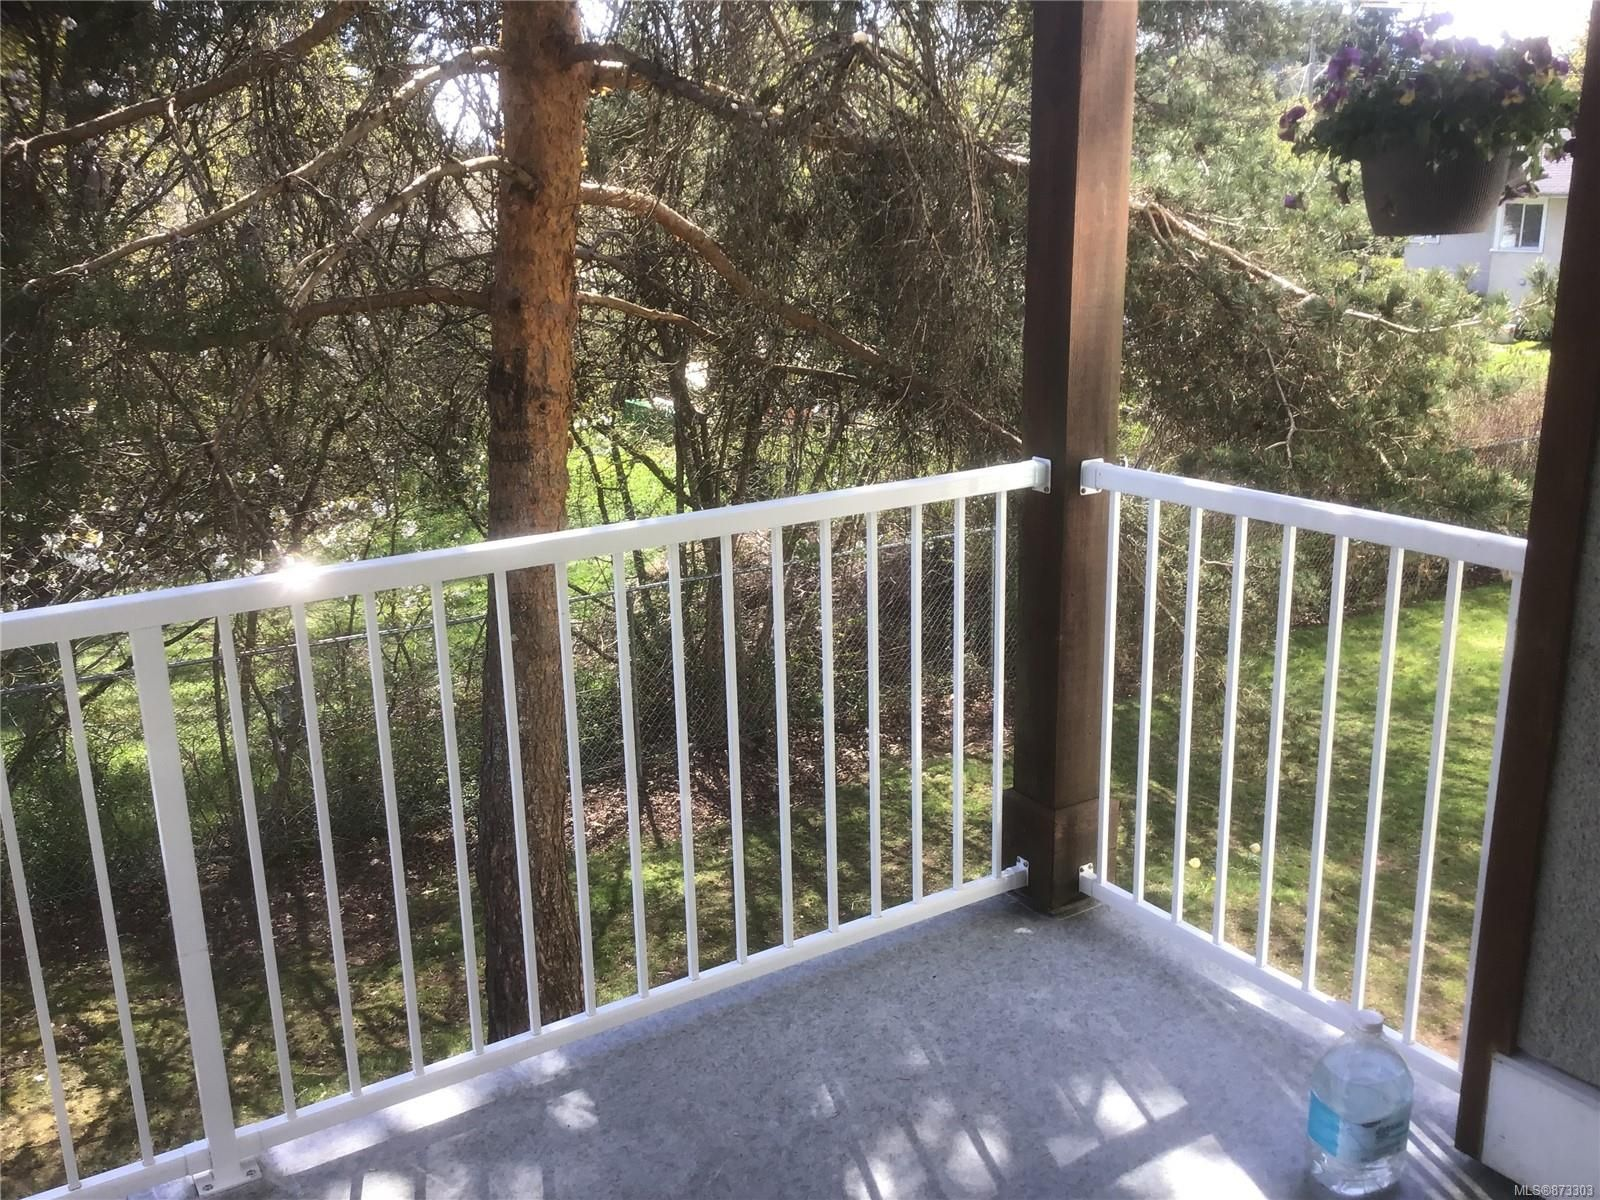 Main Photo: 210 1130 Willemar Ave in : CV Courtenay City Condo for sale (Comox Valley)  : MLS®# 873303